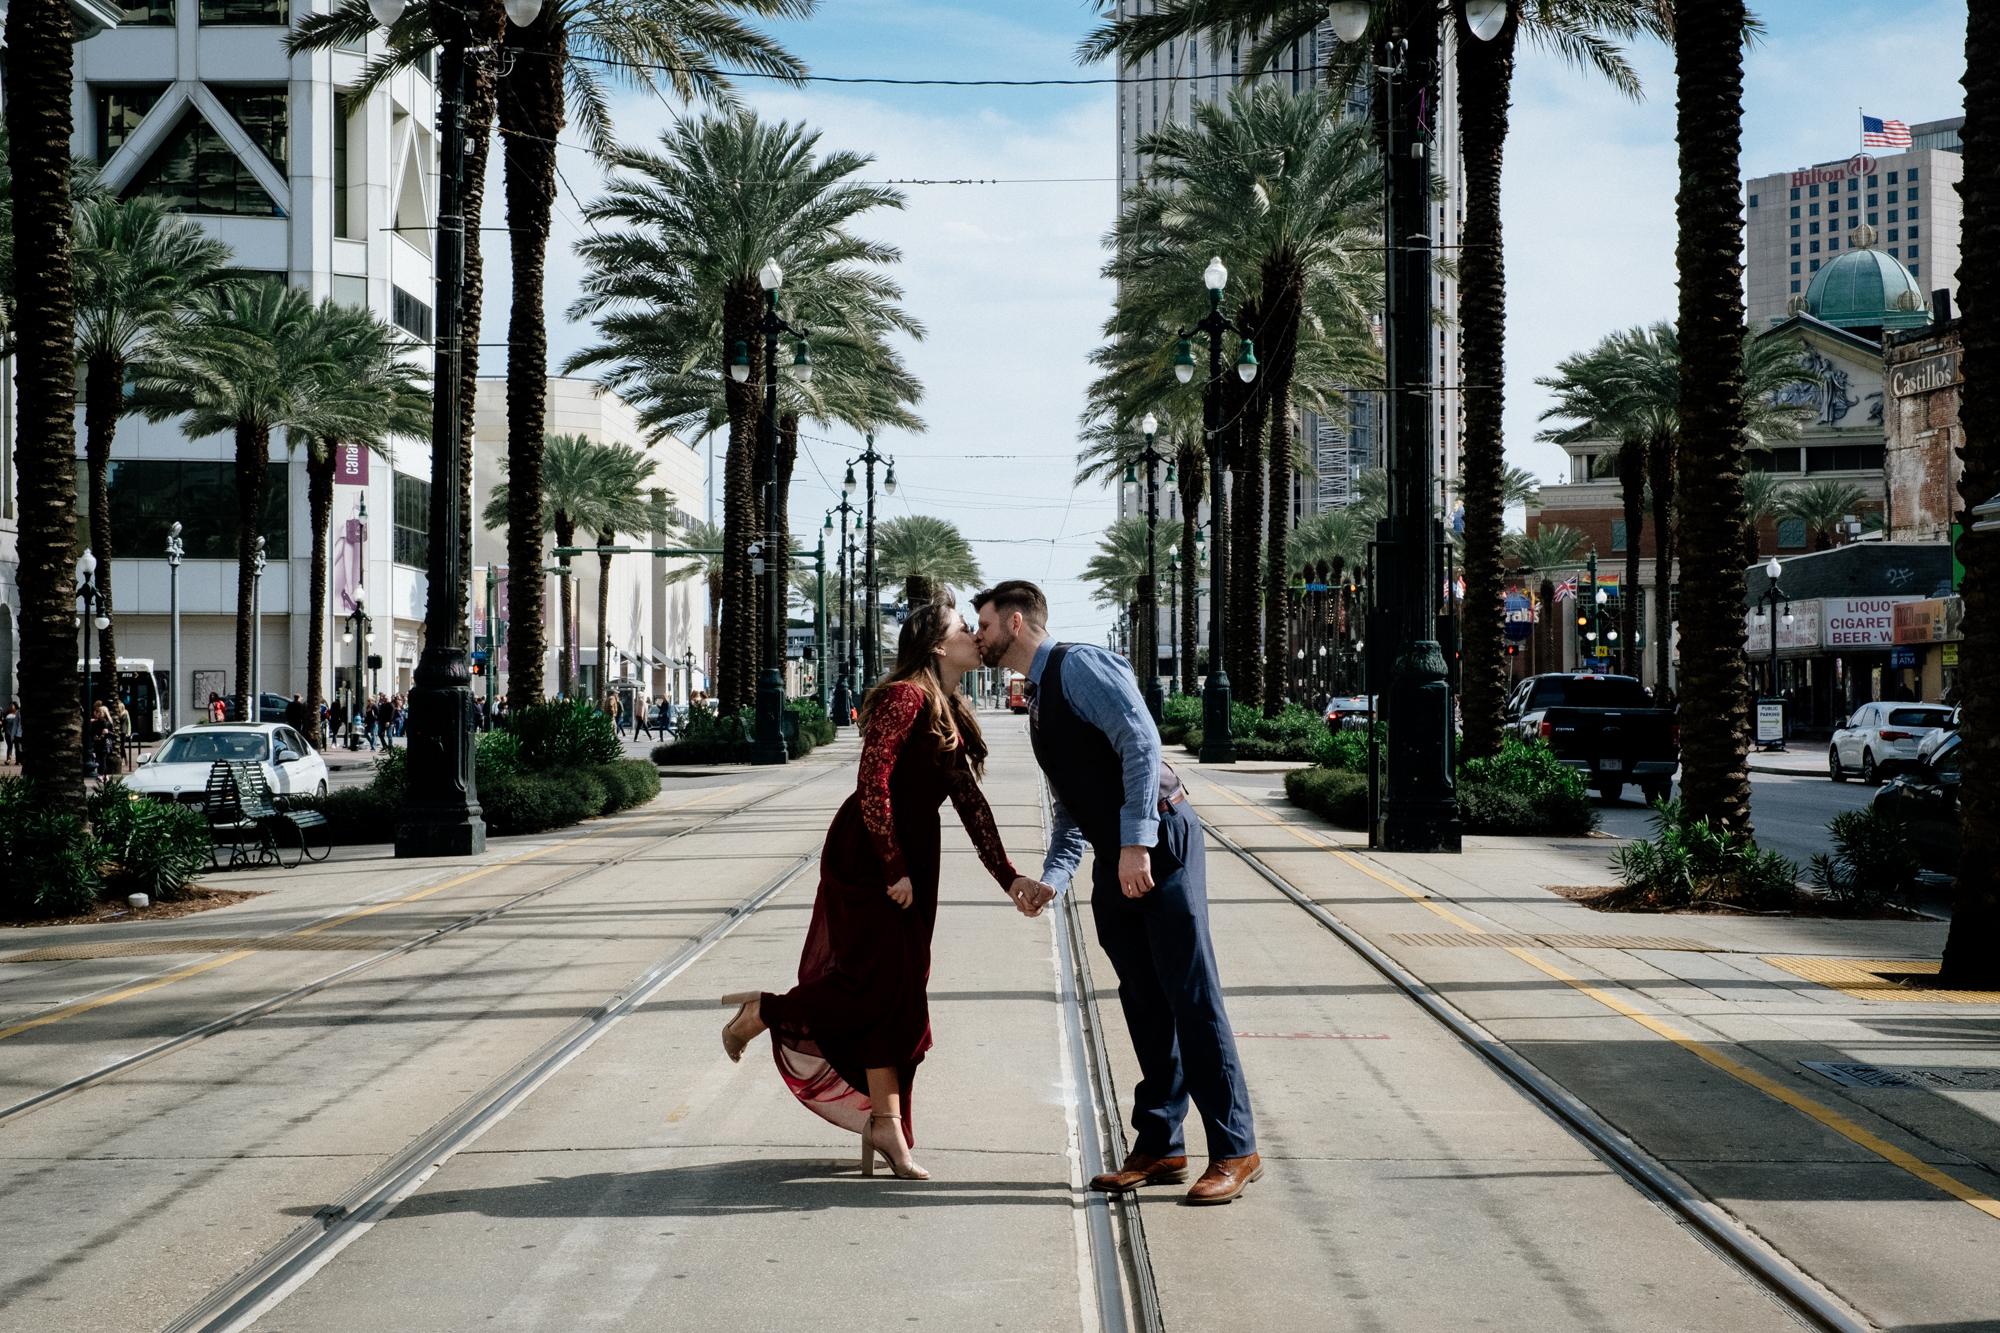 Jen_Montgomery_Photography_Angela_Brian_Engagement_Proposal_FB-99.jpg